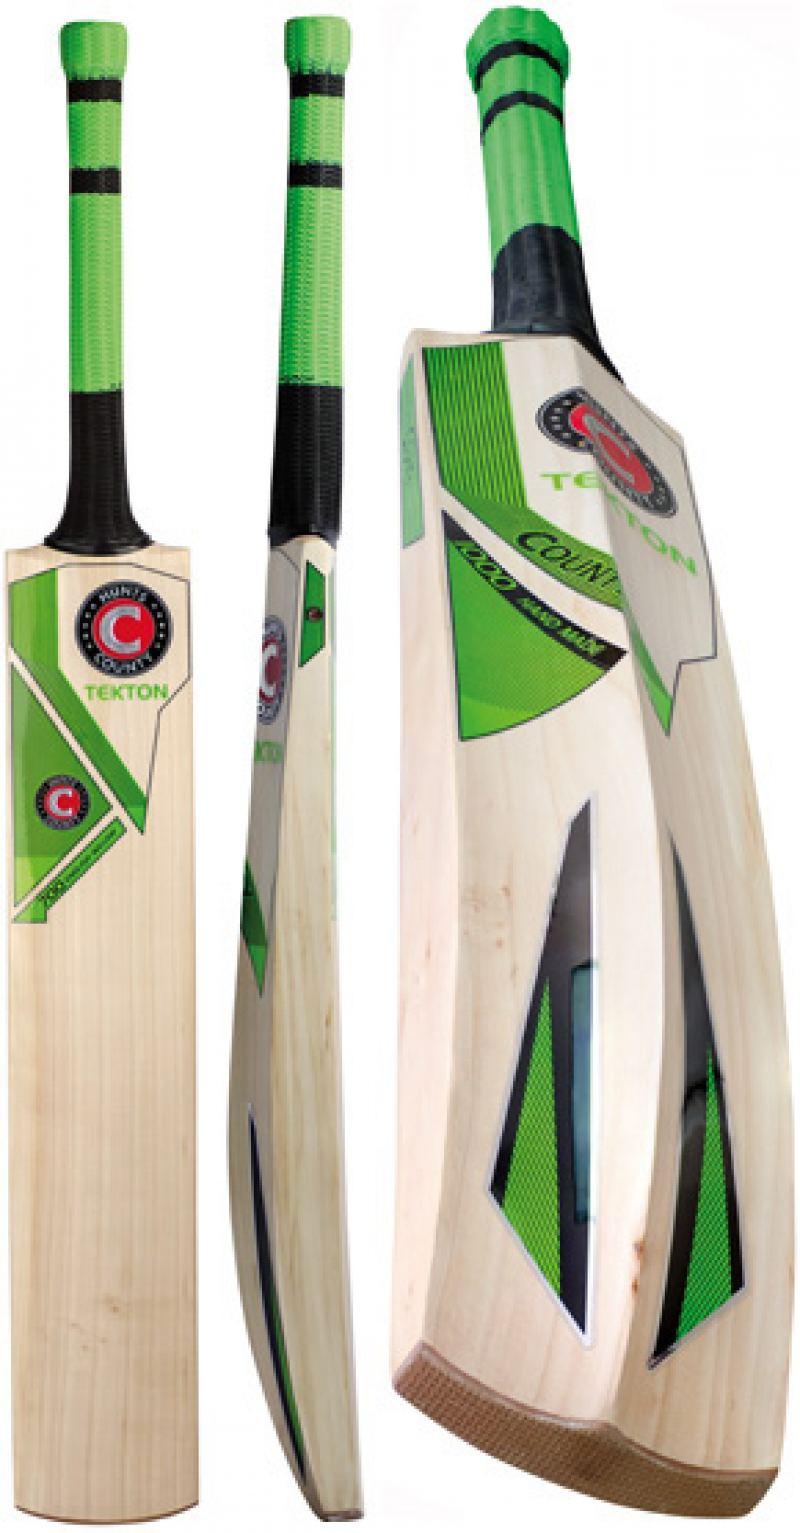 Hunts County Tekton 100 Junior Cricket Bat (Kashmir Willow)